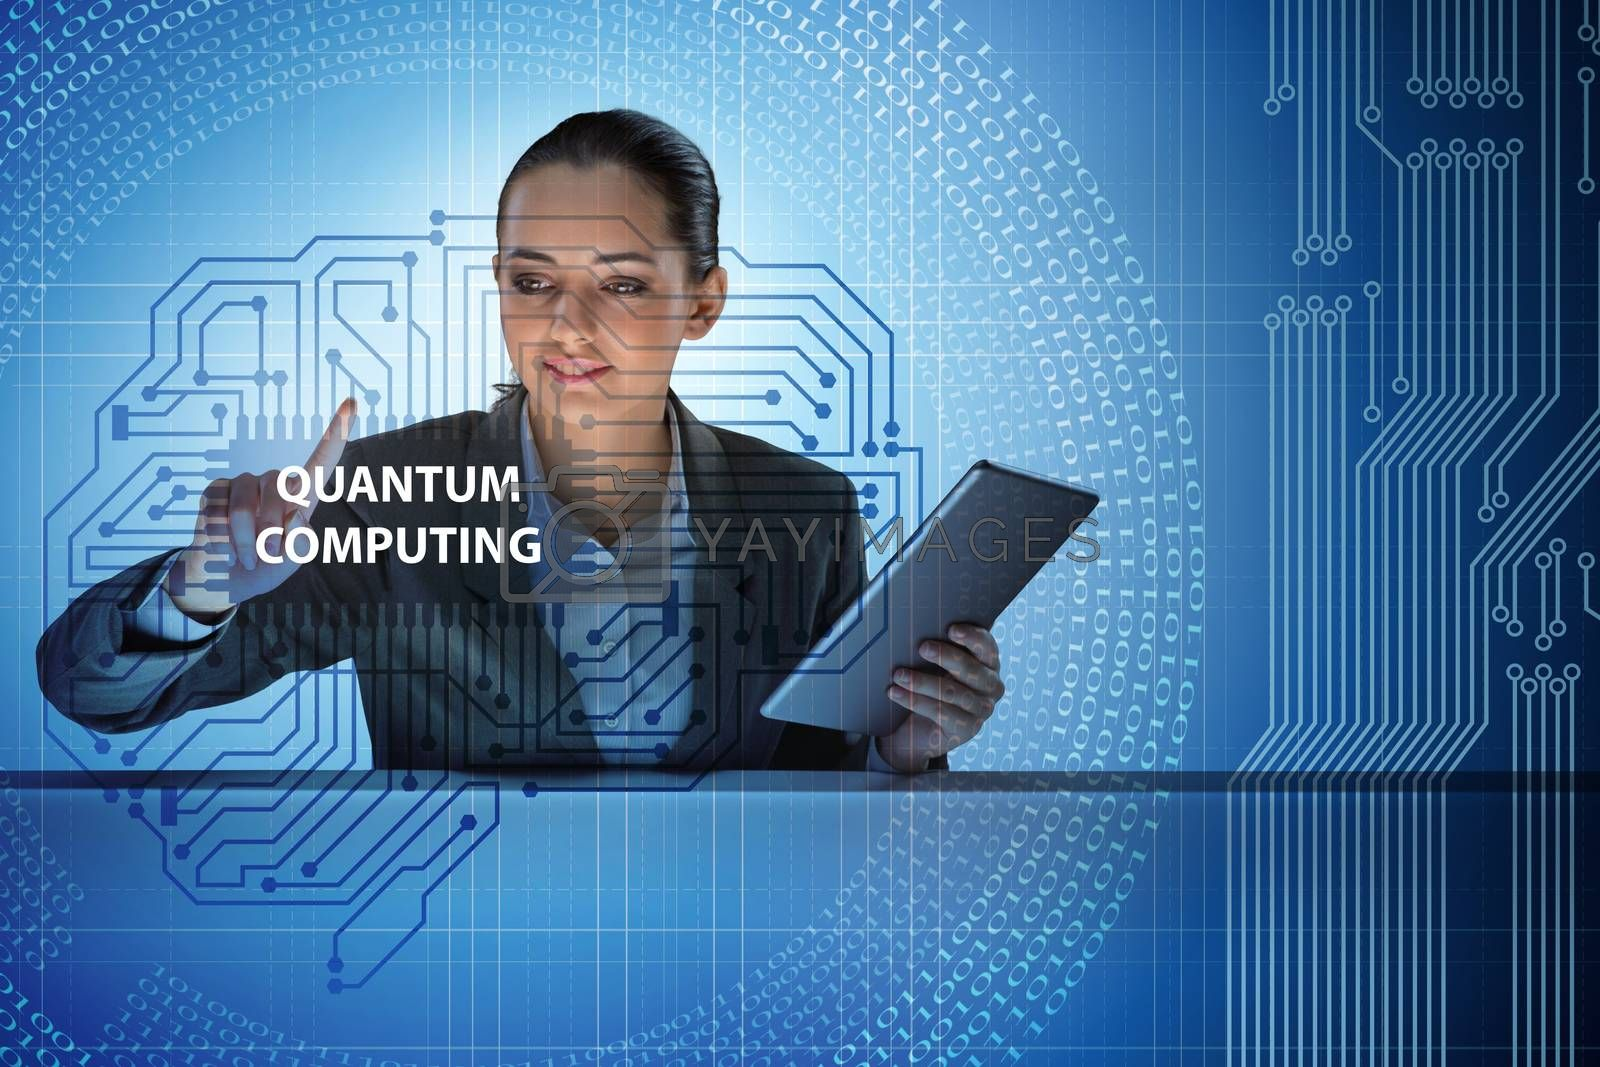 Businesswoman pressing virtual button in quantum computing concept